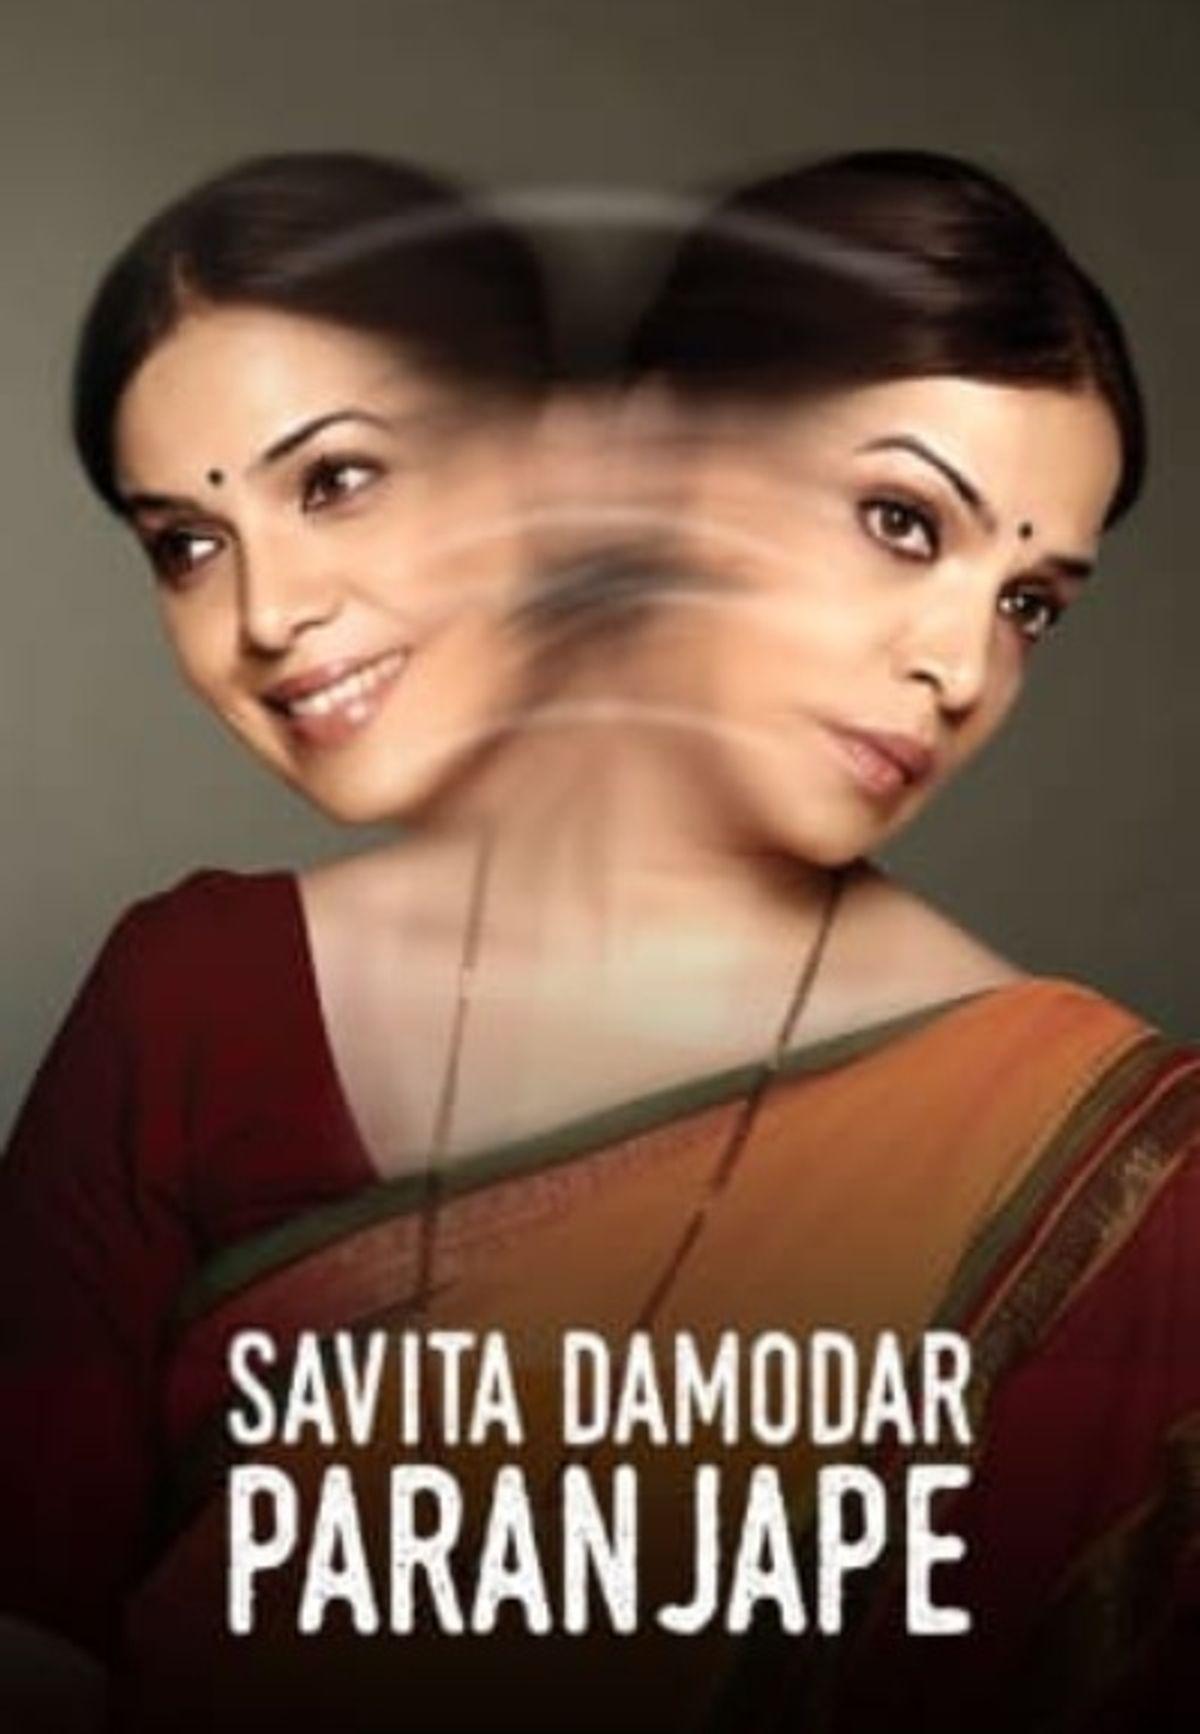 Savita Damodar Paranjape